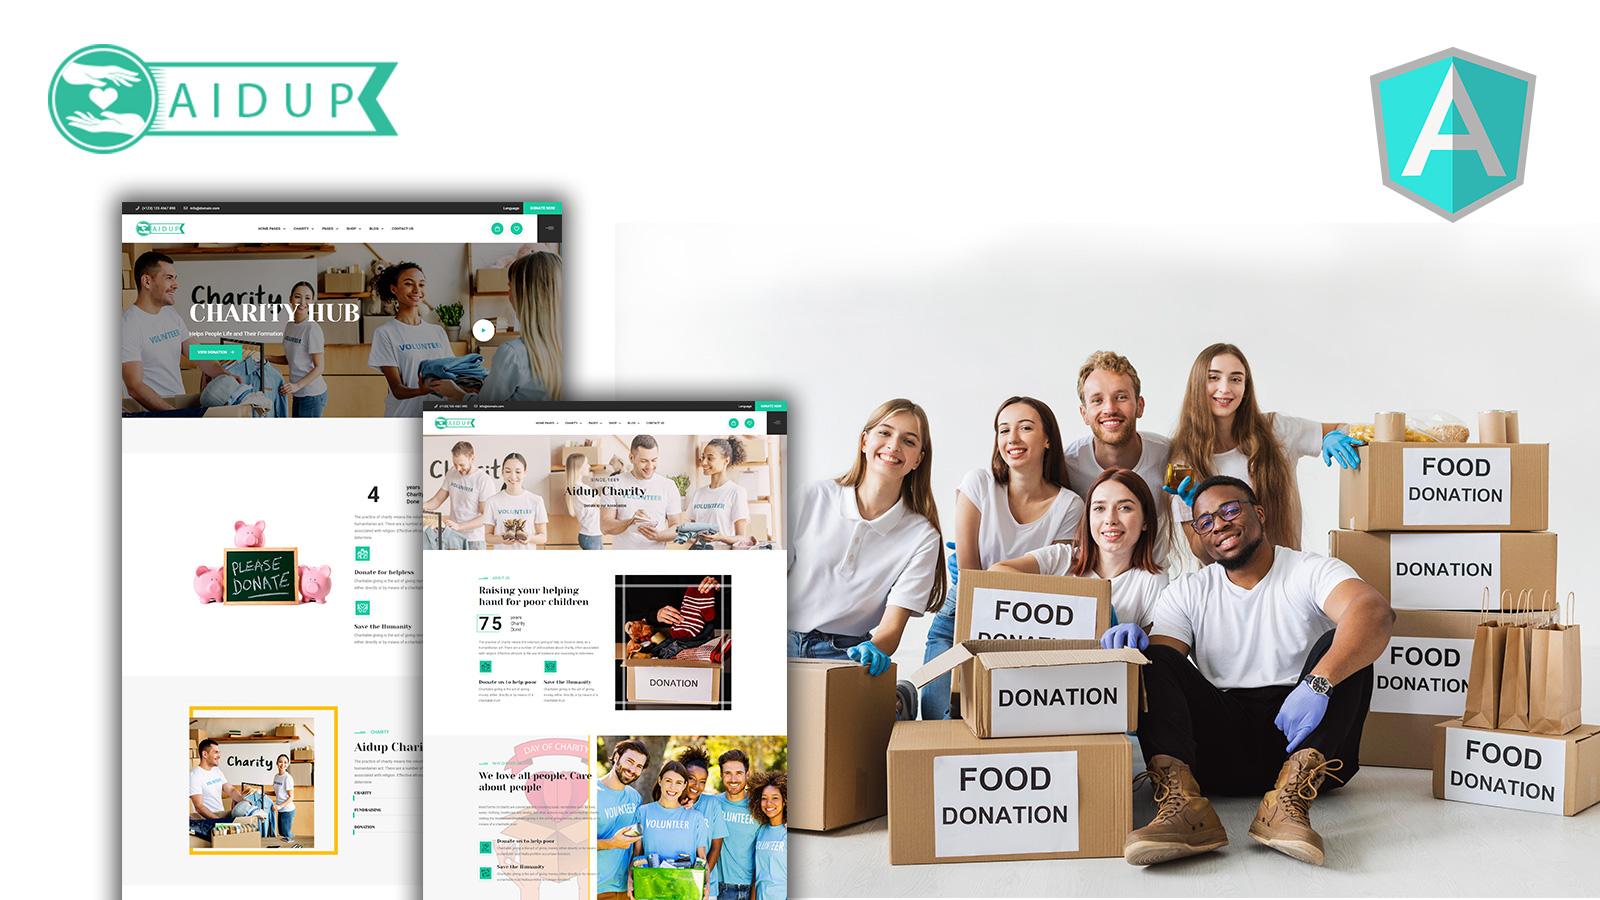 Aidup - Charity Angular Website Template